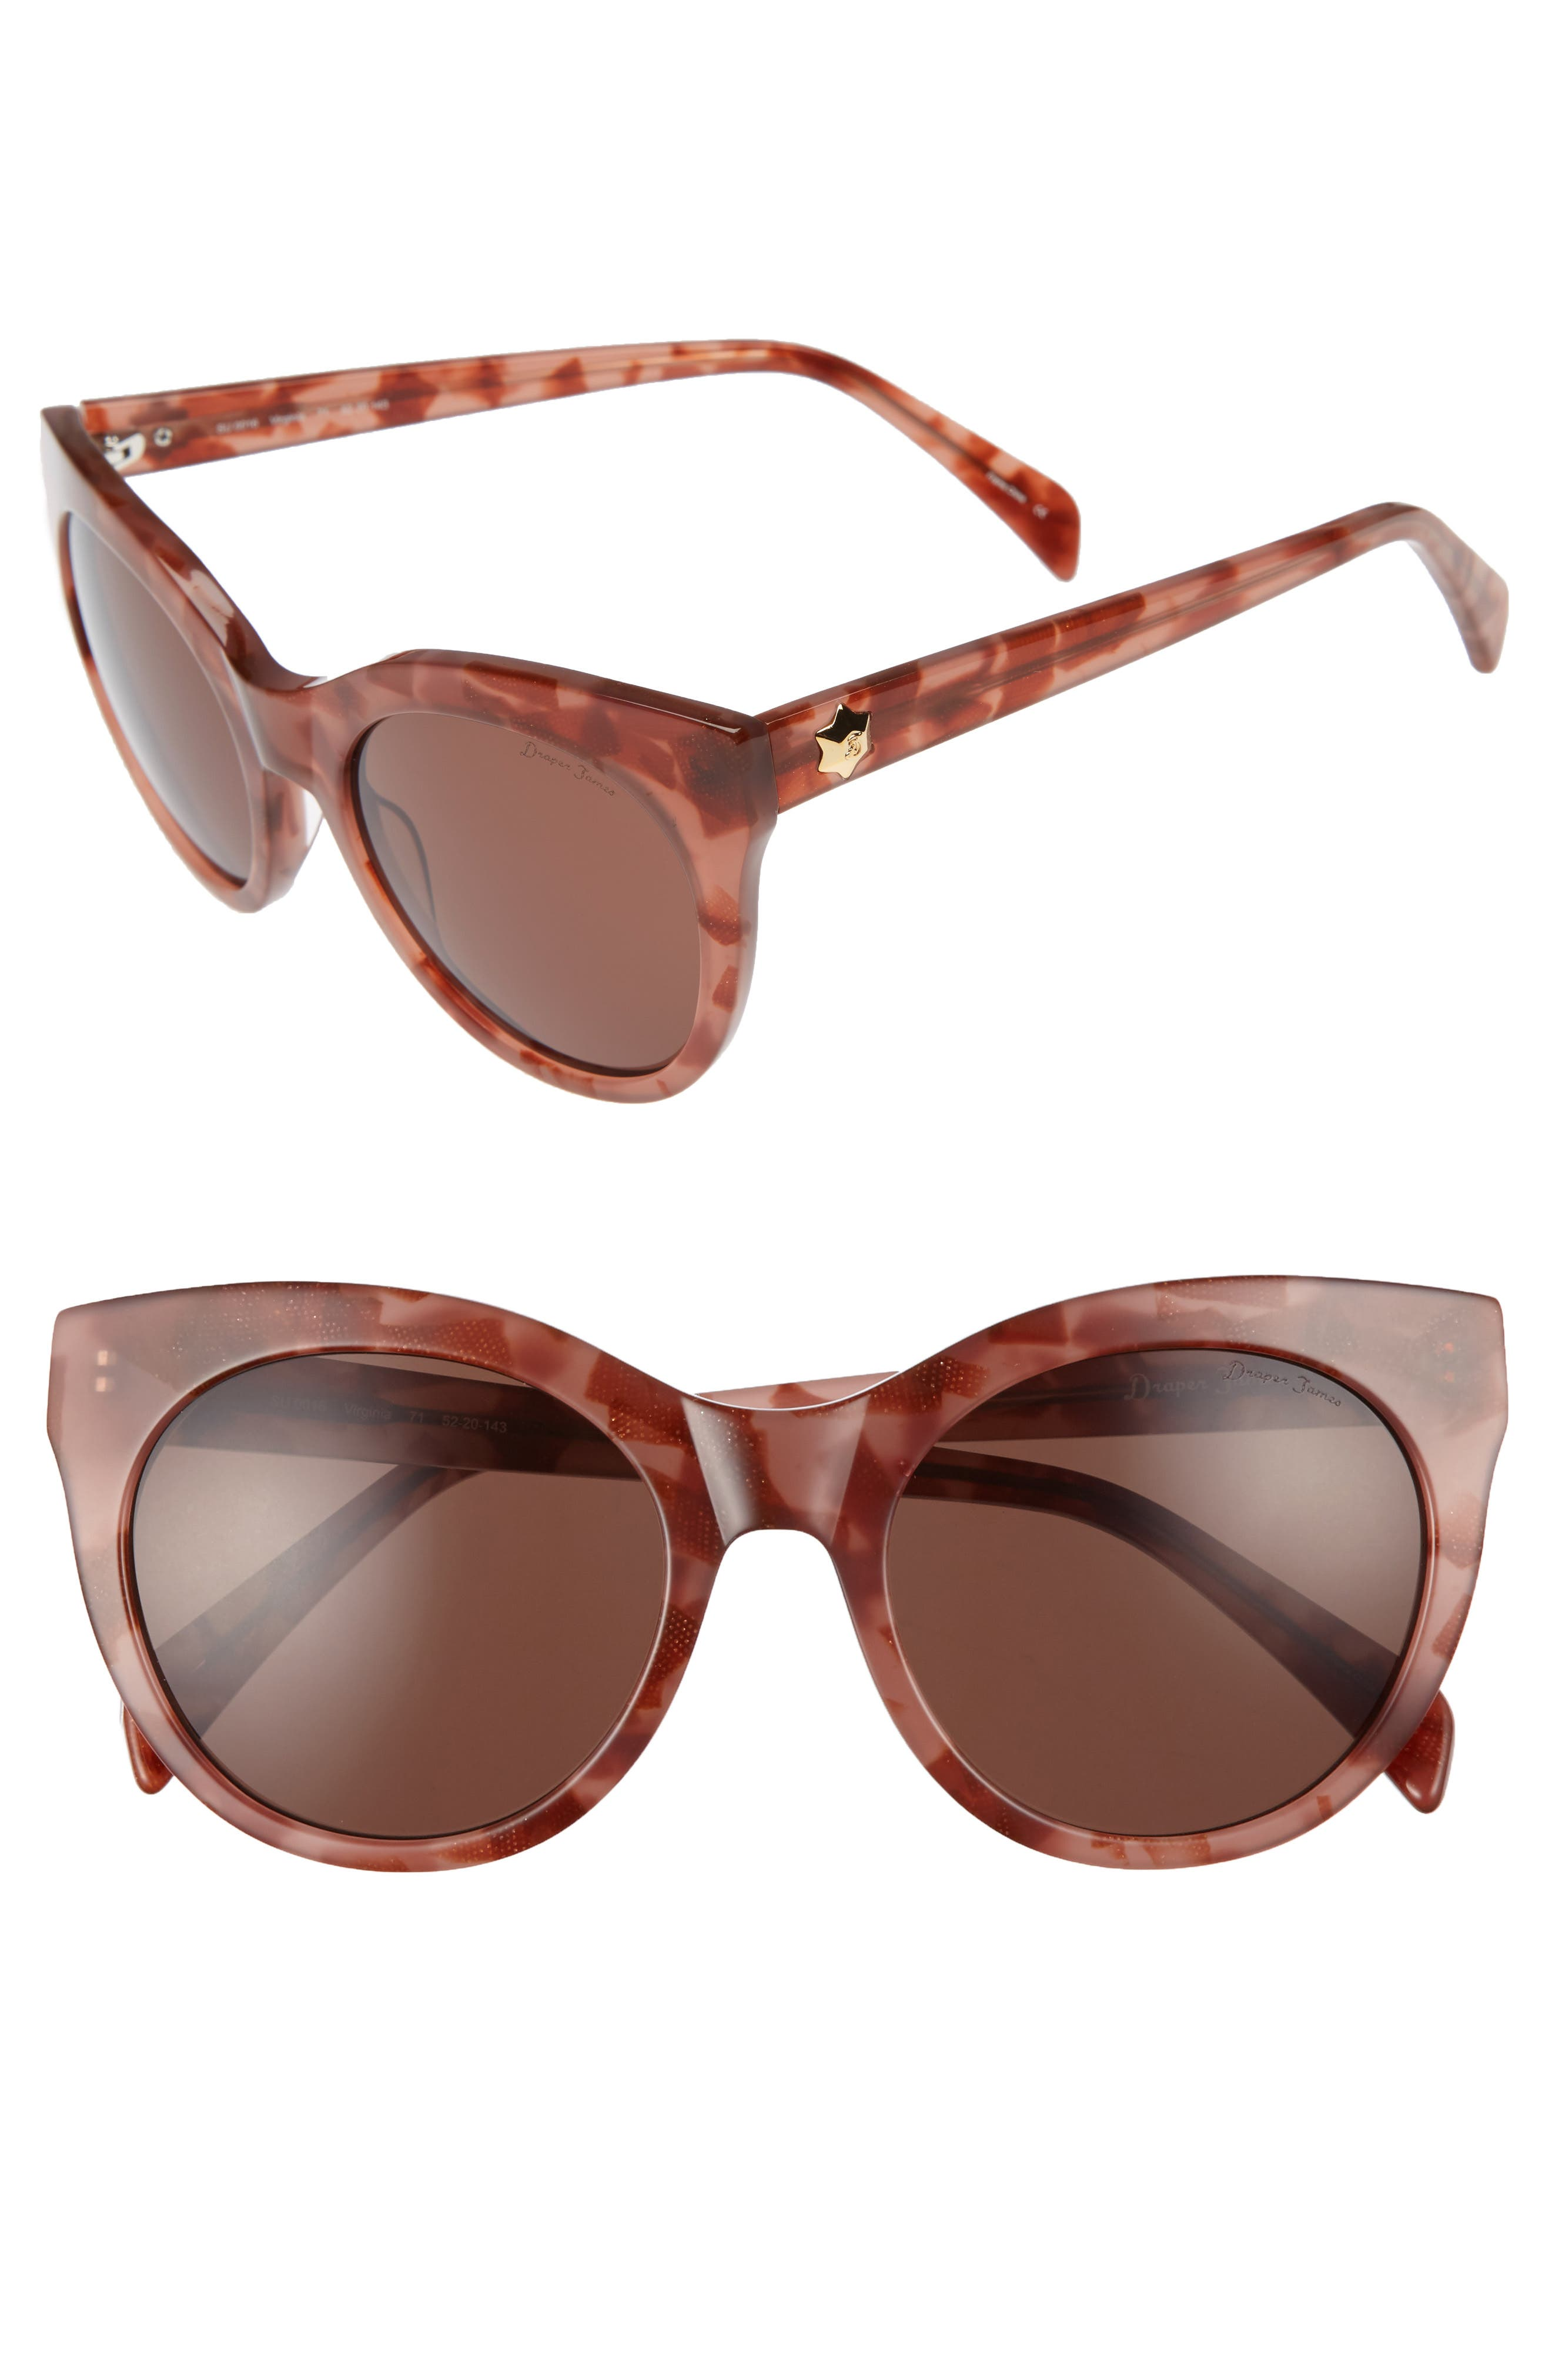 52mm Round Cat Eye Sunglasses,                             Main thumbnail 4, color,